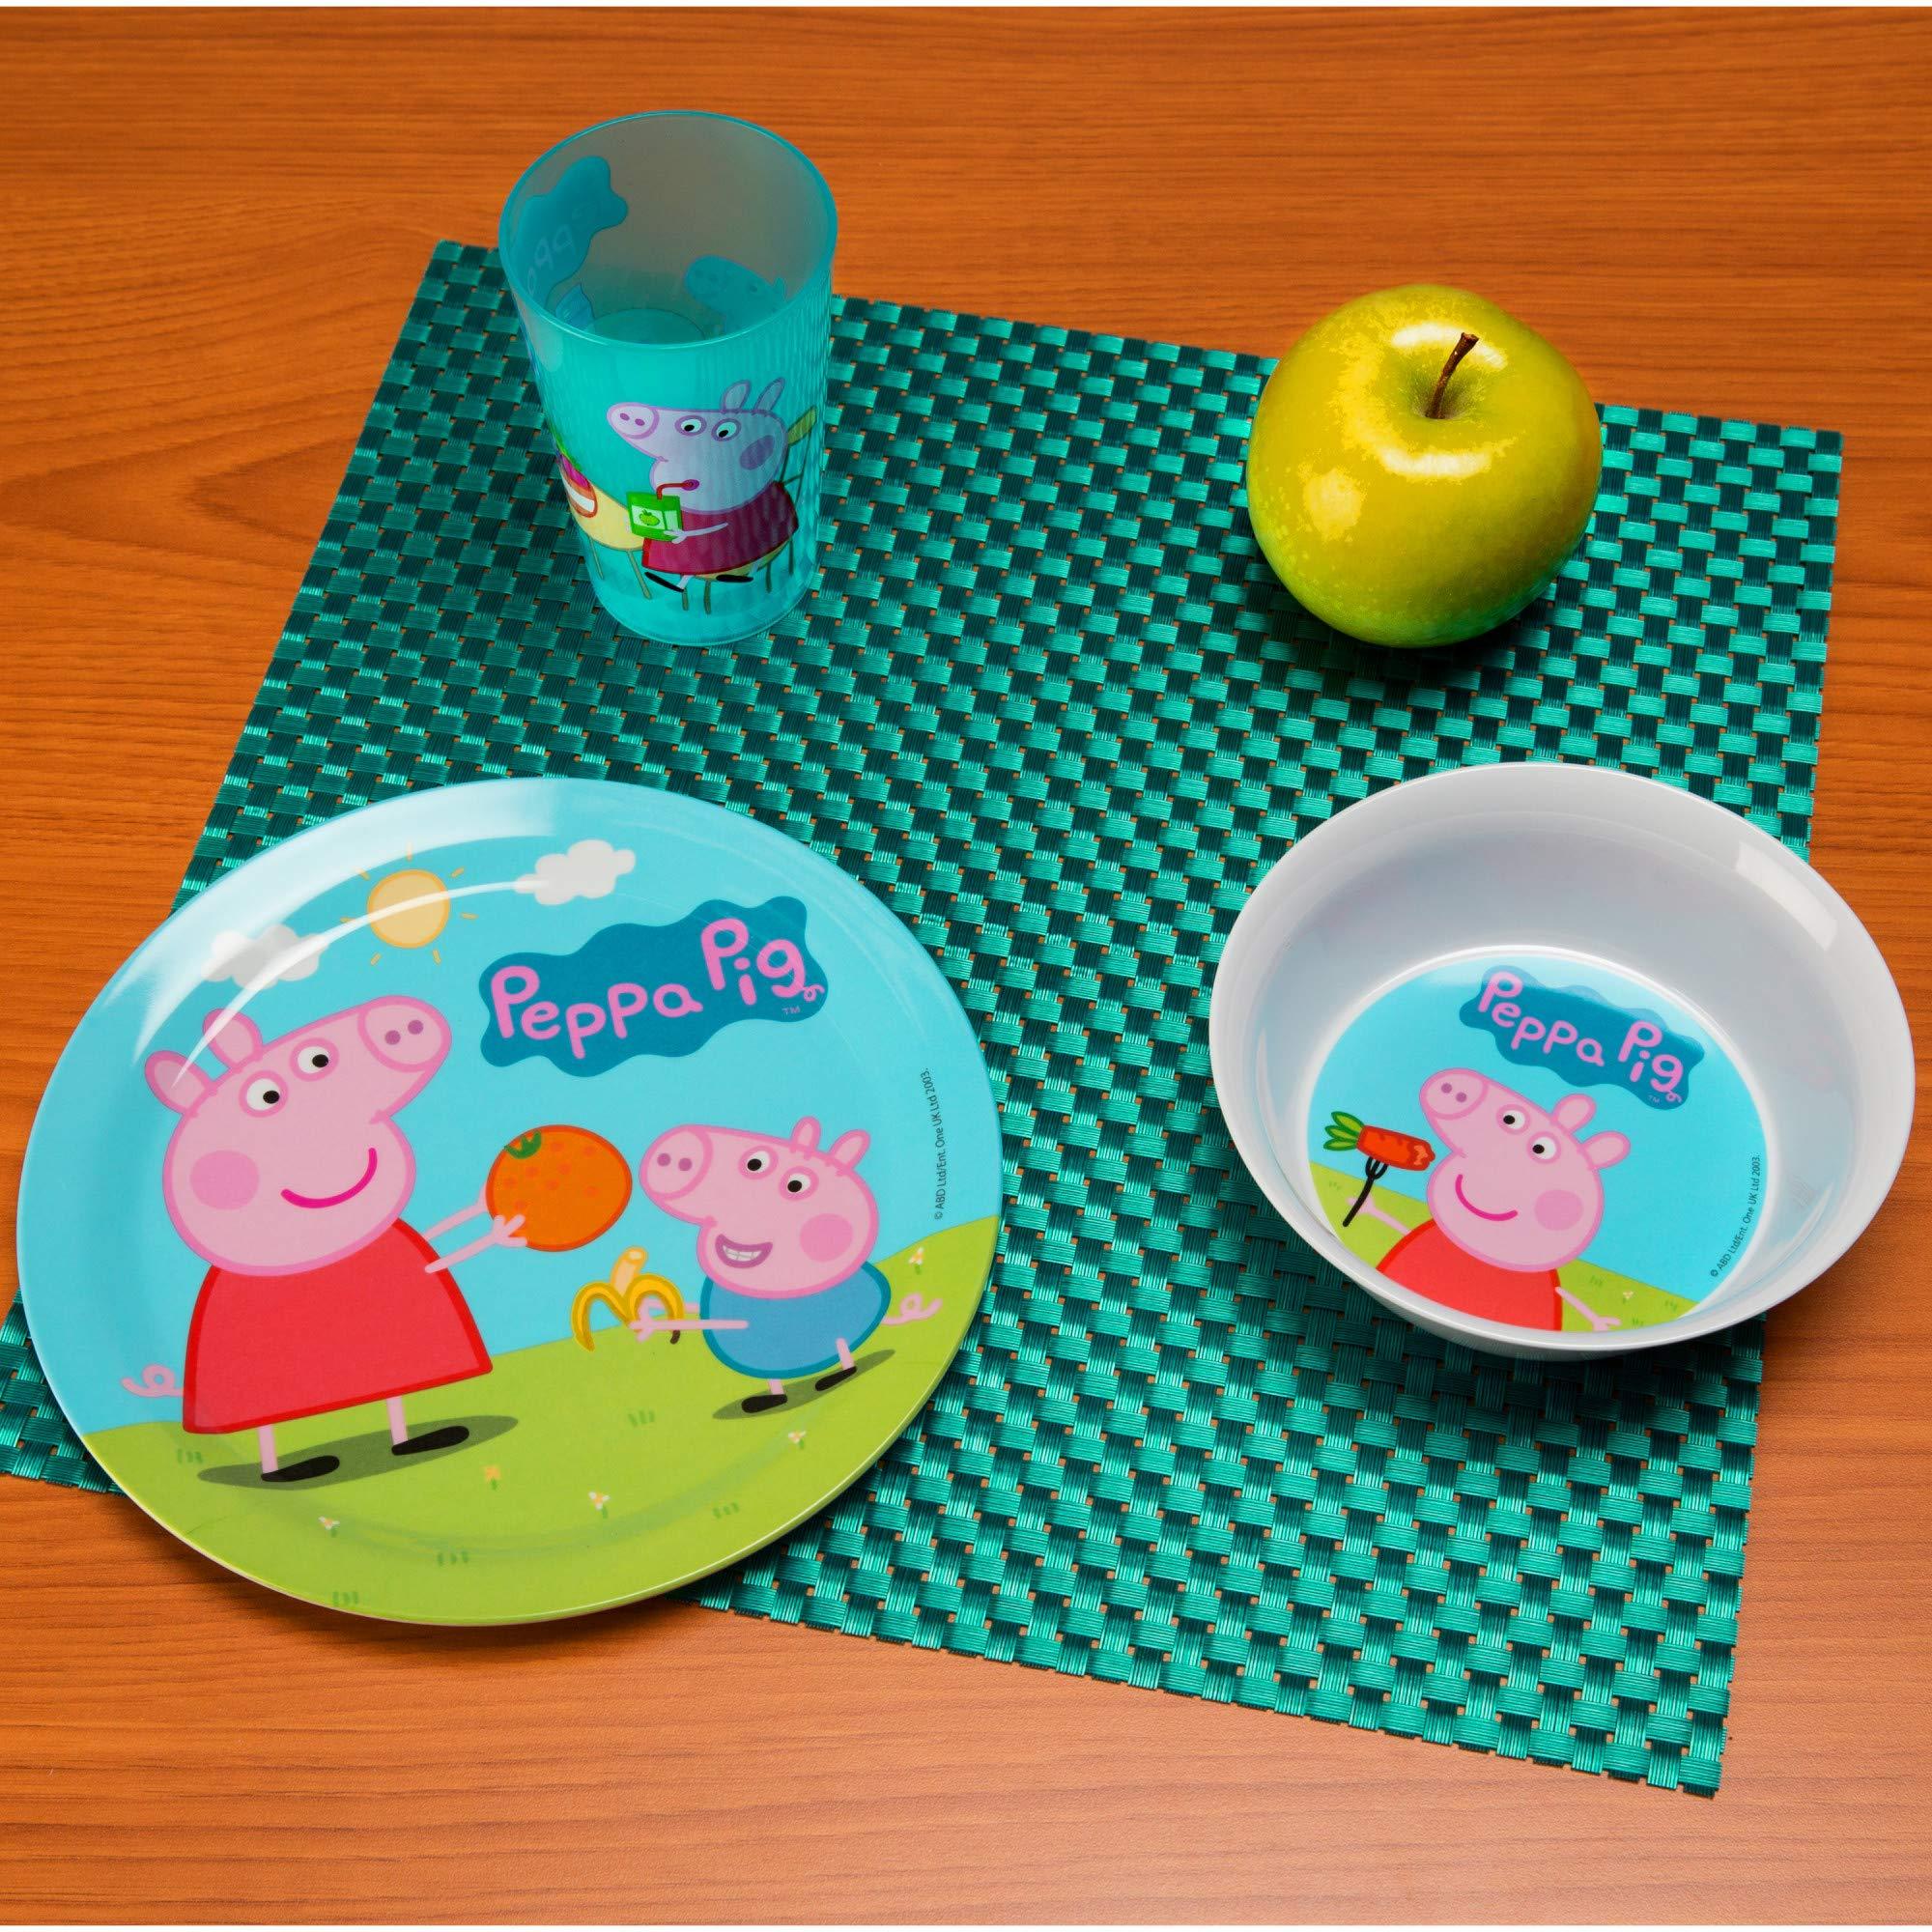 Nick Jr. PEPA-0391 Peppa Pig Melamine Plates 3-piece set by Zak Designs by Zak Designs (Image #7)